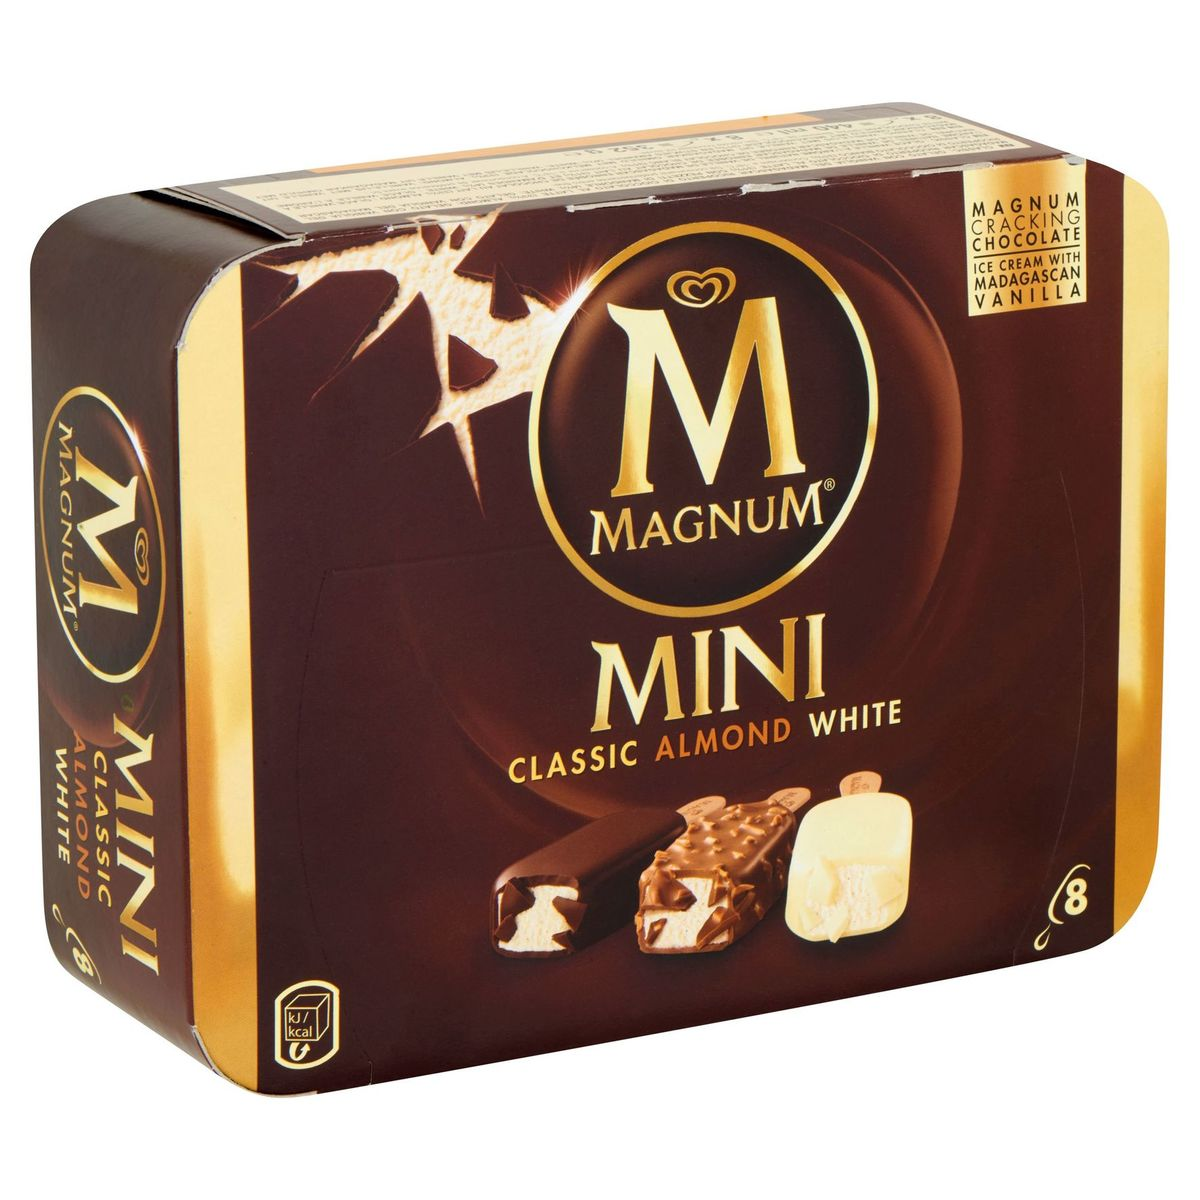 Magnum Ola Ijs Multipack Mini Classic Almond White 8 x 55 ml